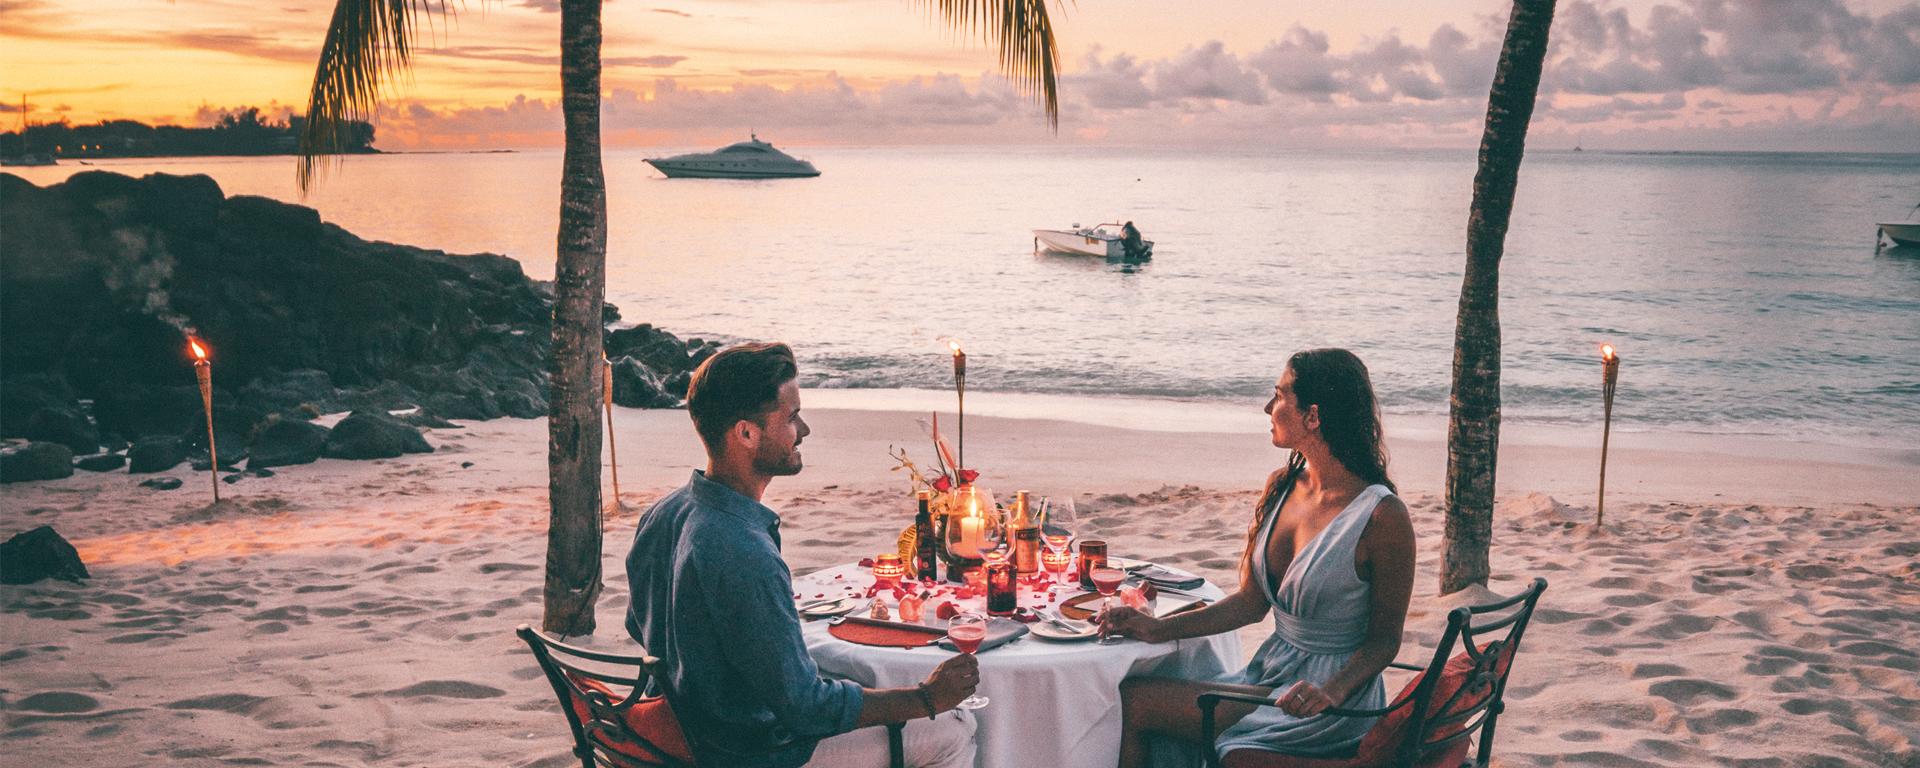 honeymoon royal palm beachcomber luxury mauritius